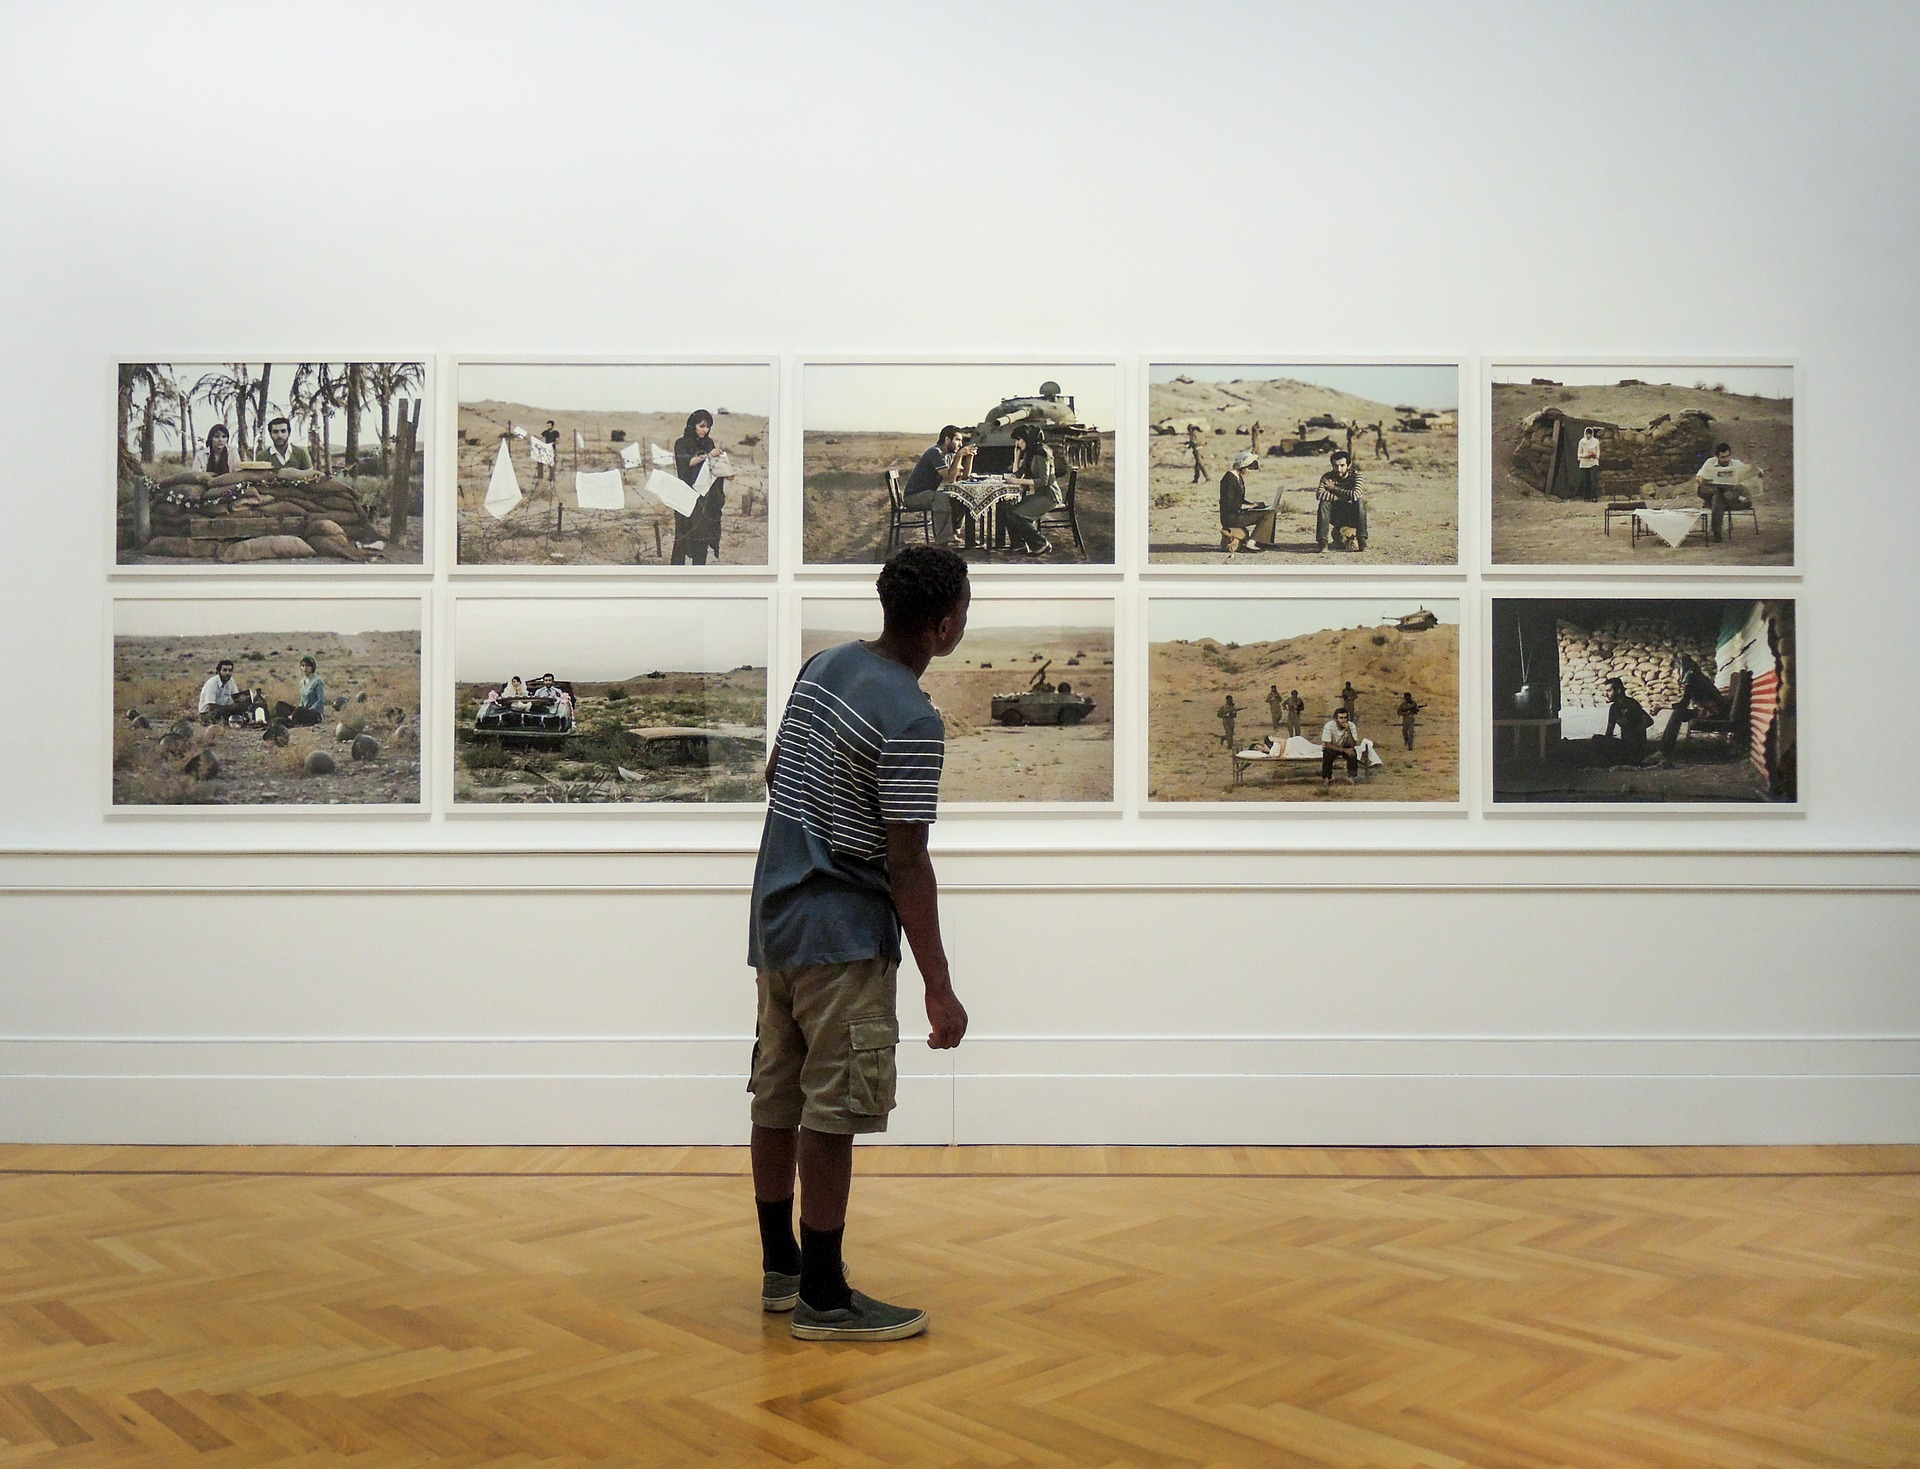 muzeji, rim, italija, izlozba, fotografije